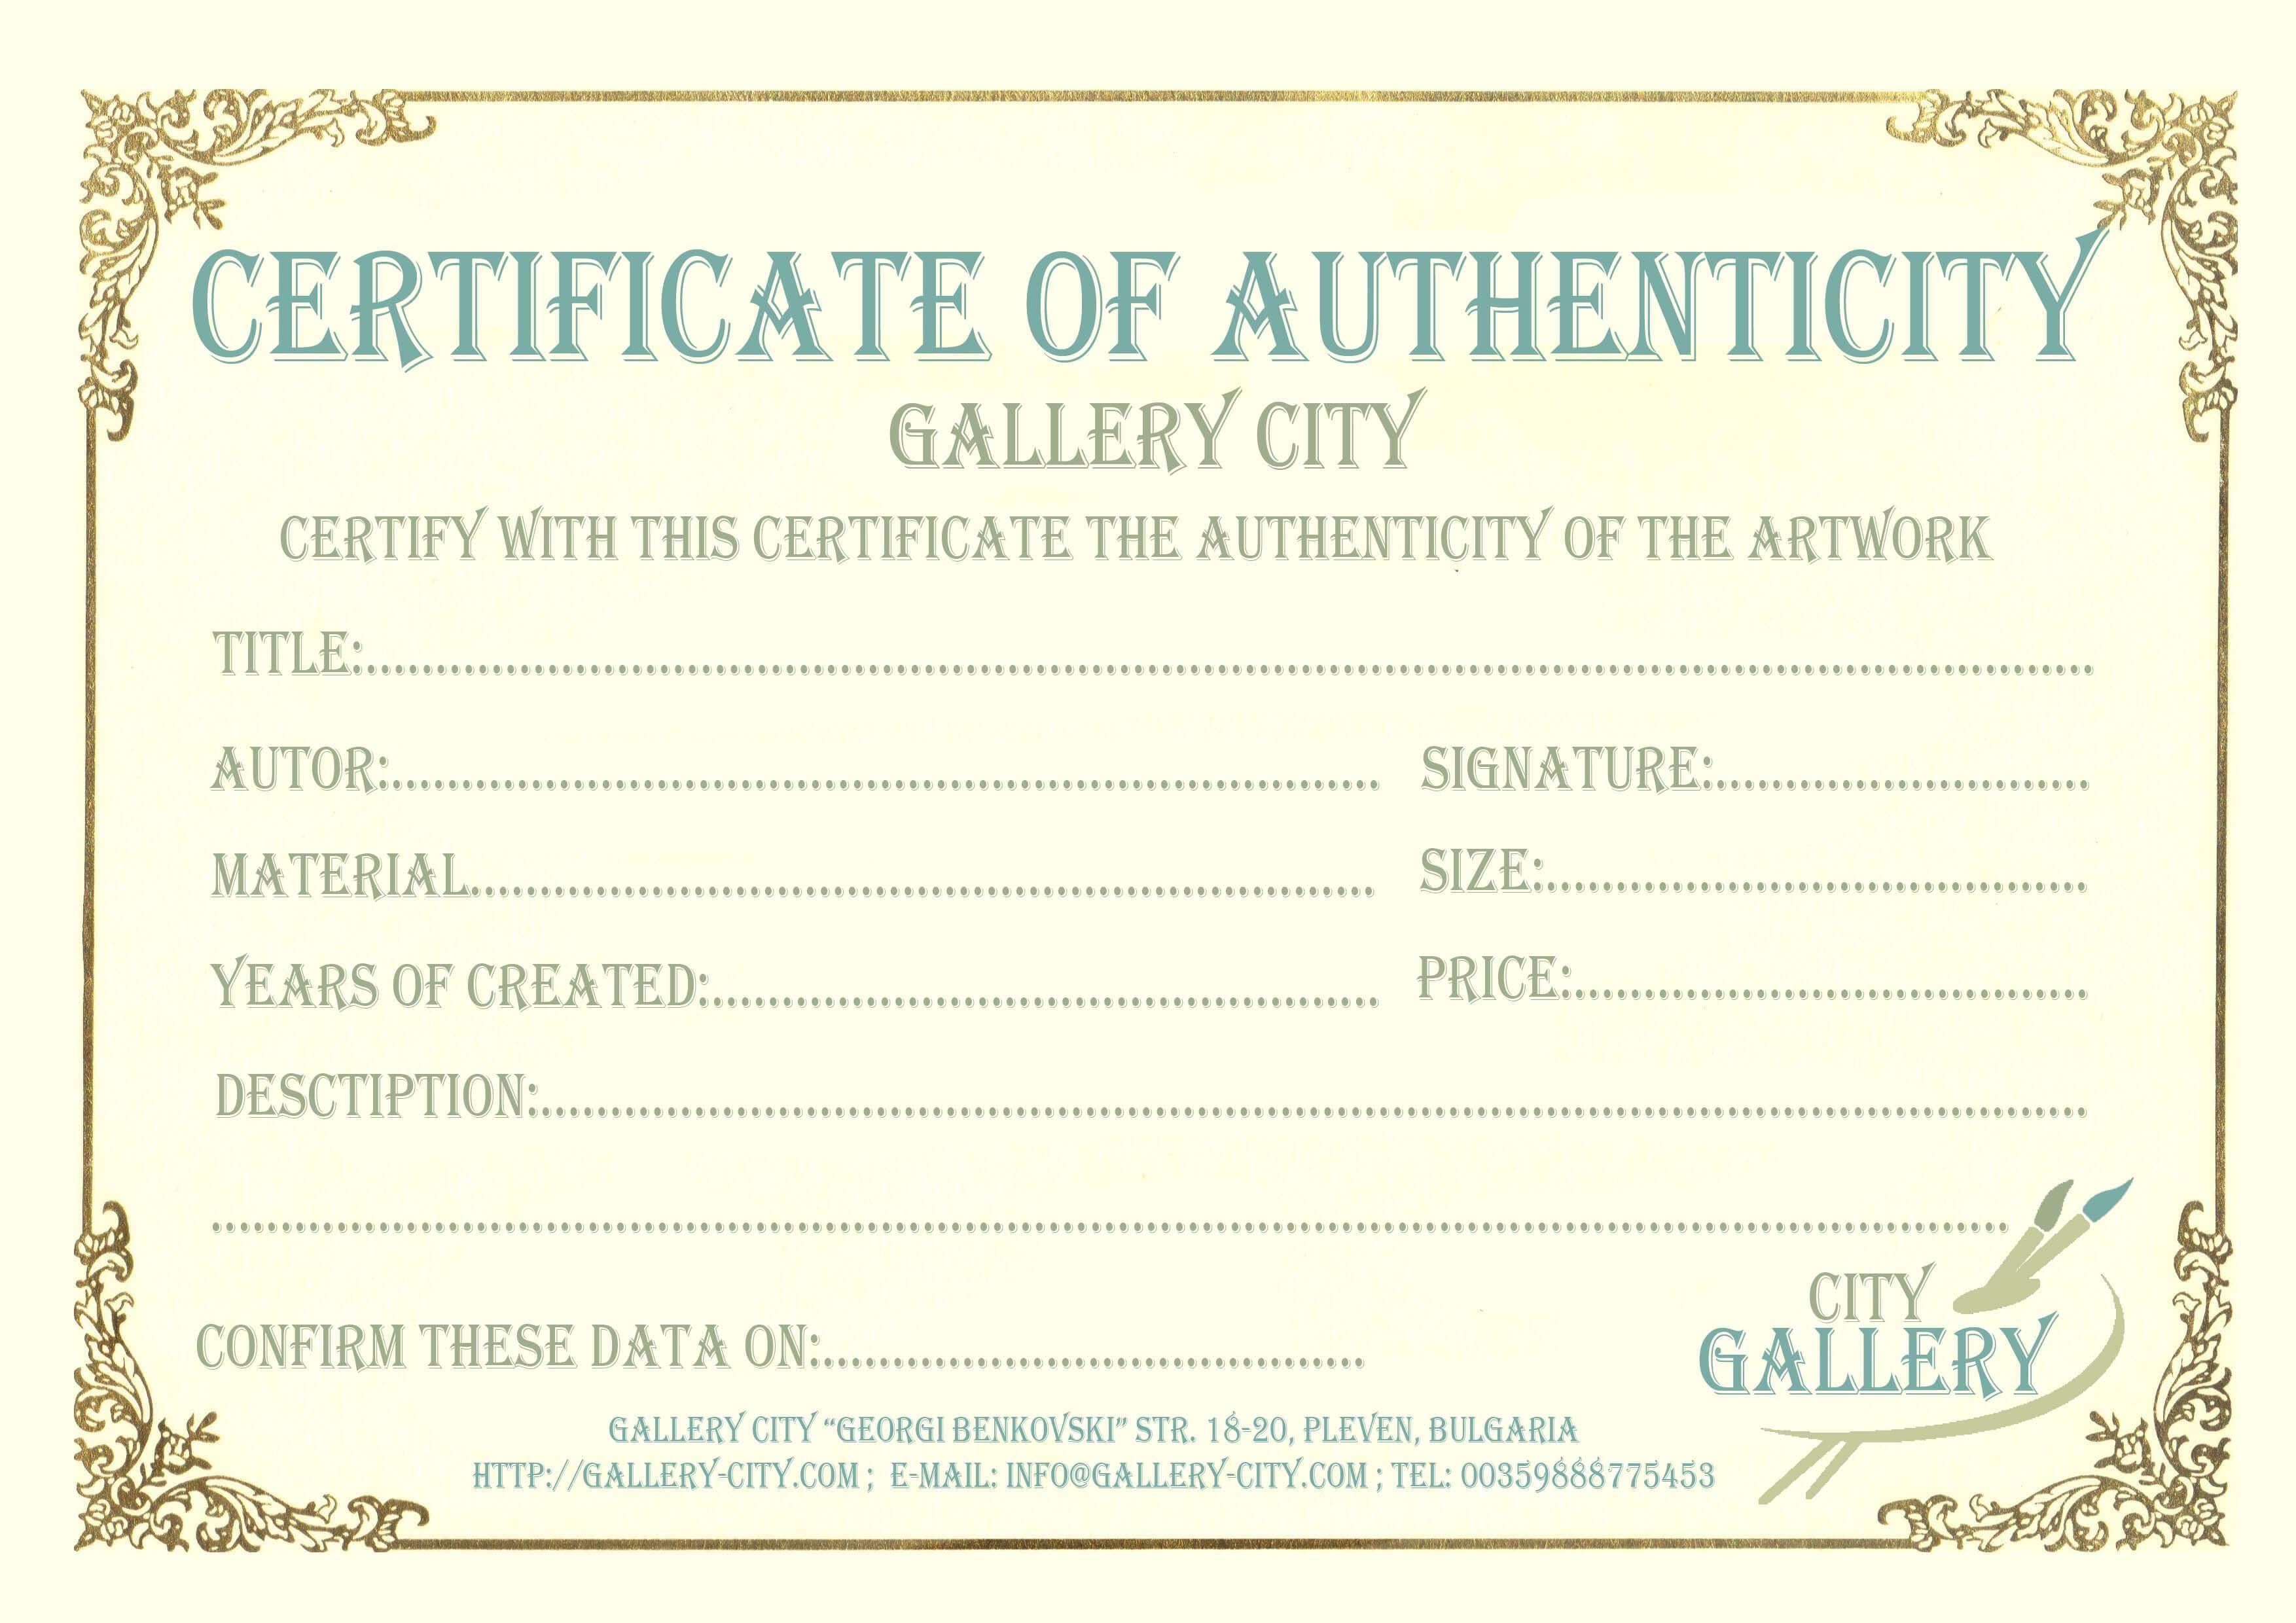 Certificate Authenticity Template Art Authenticity For Certificate Of Authenticity Photography Template